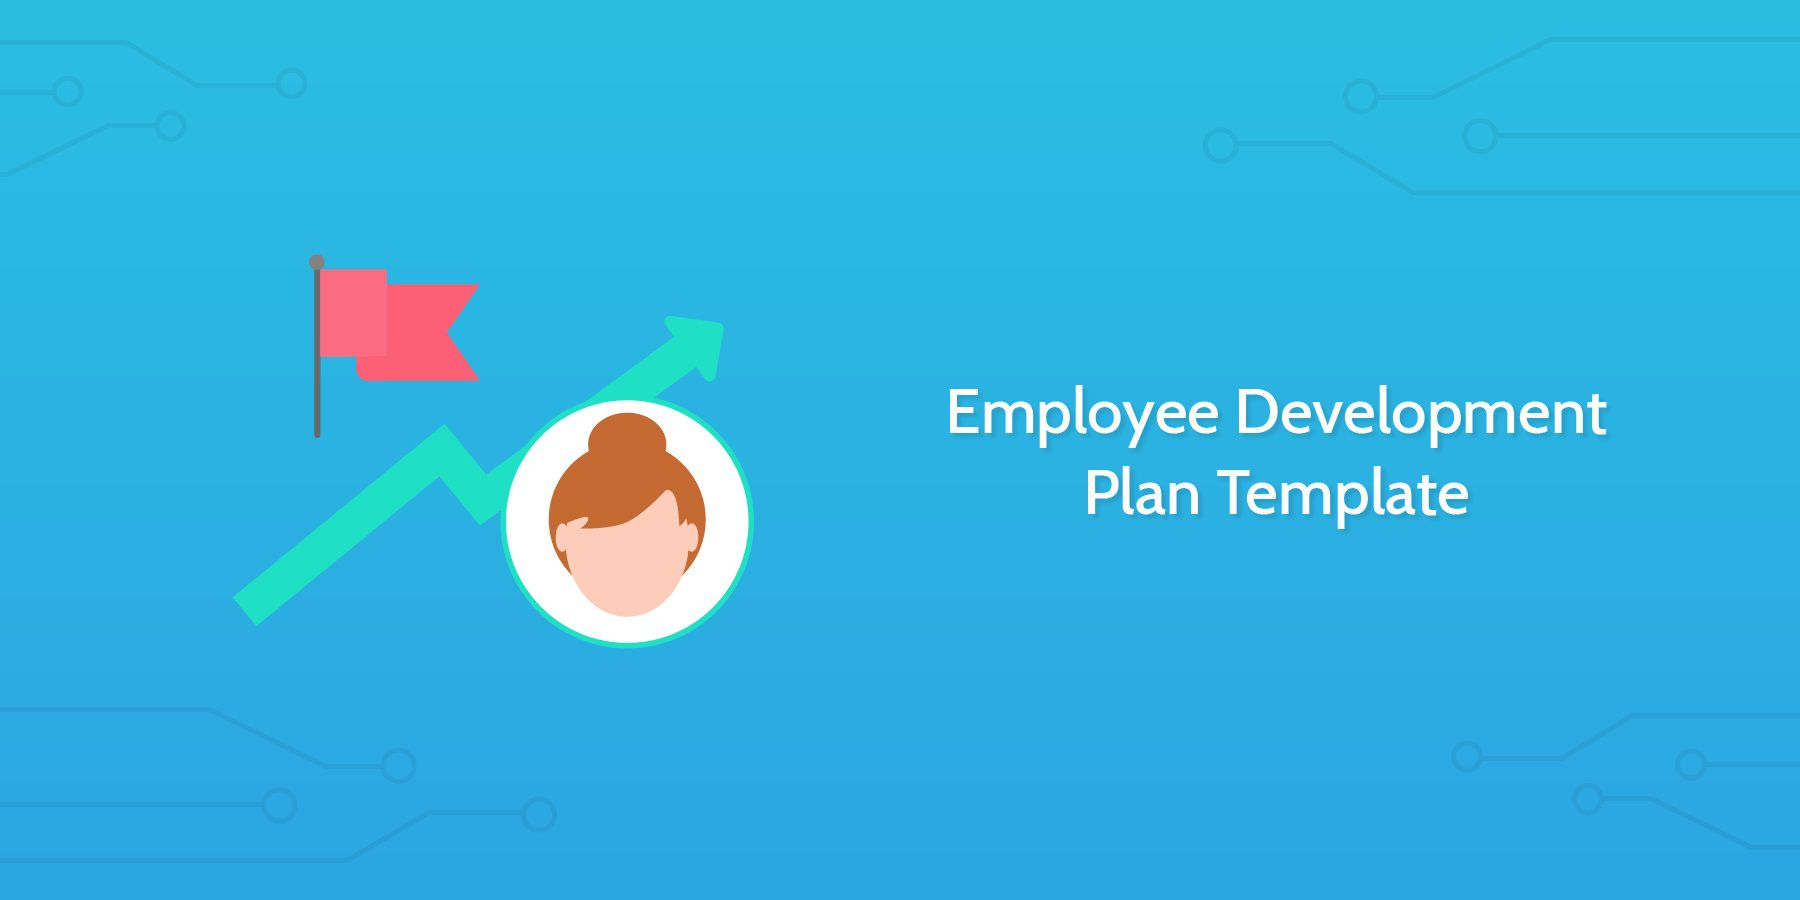 003 Dreaded Employee Development Plan Template Photo  Ppt FreeFull